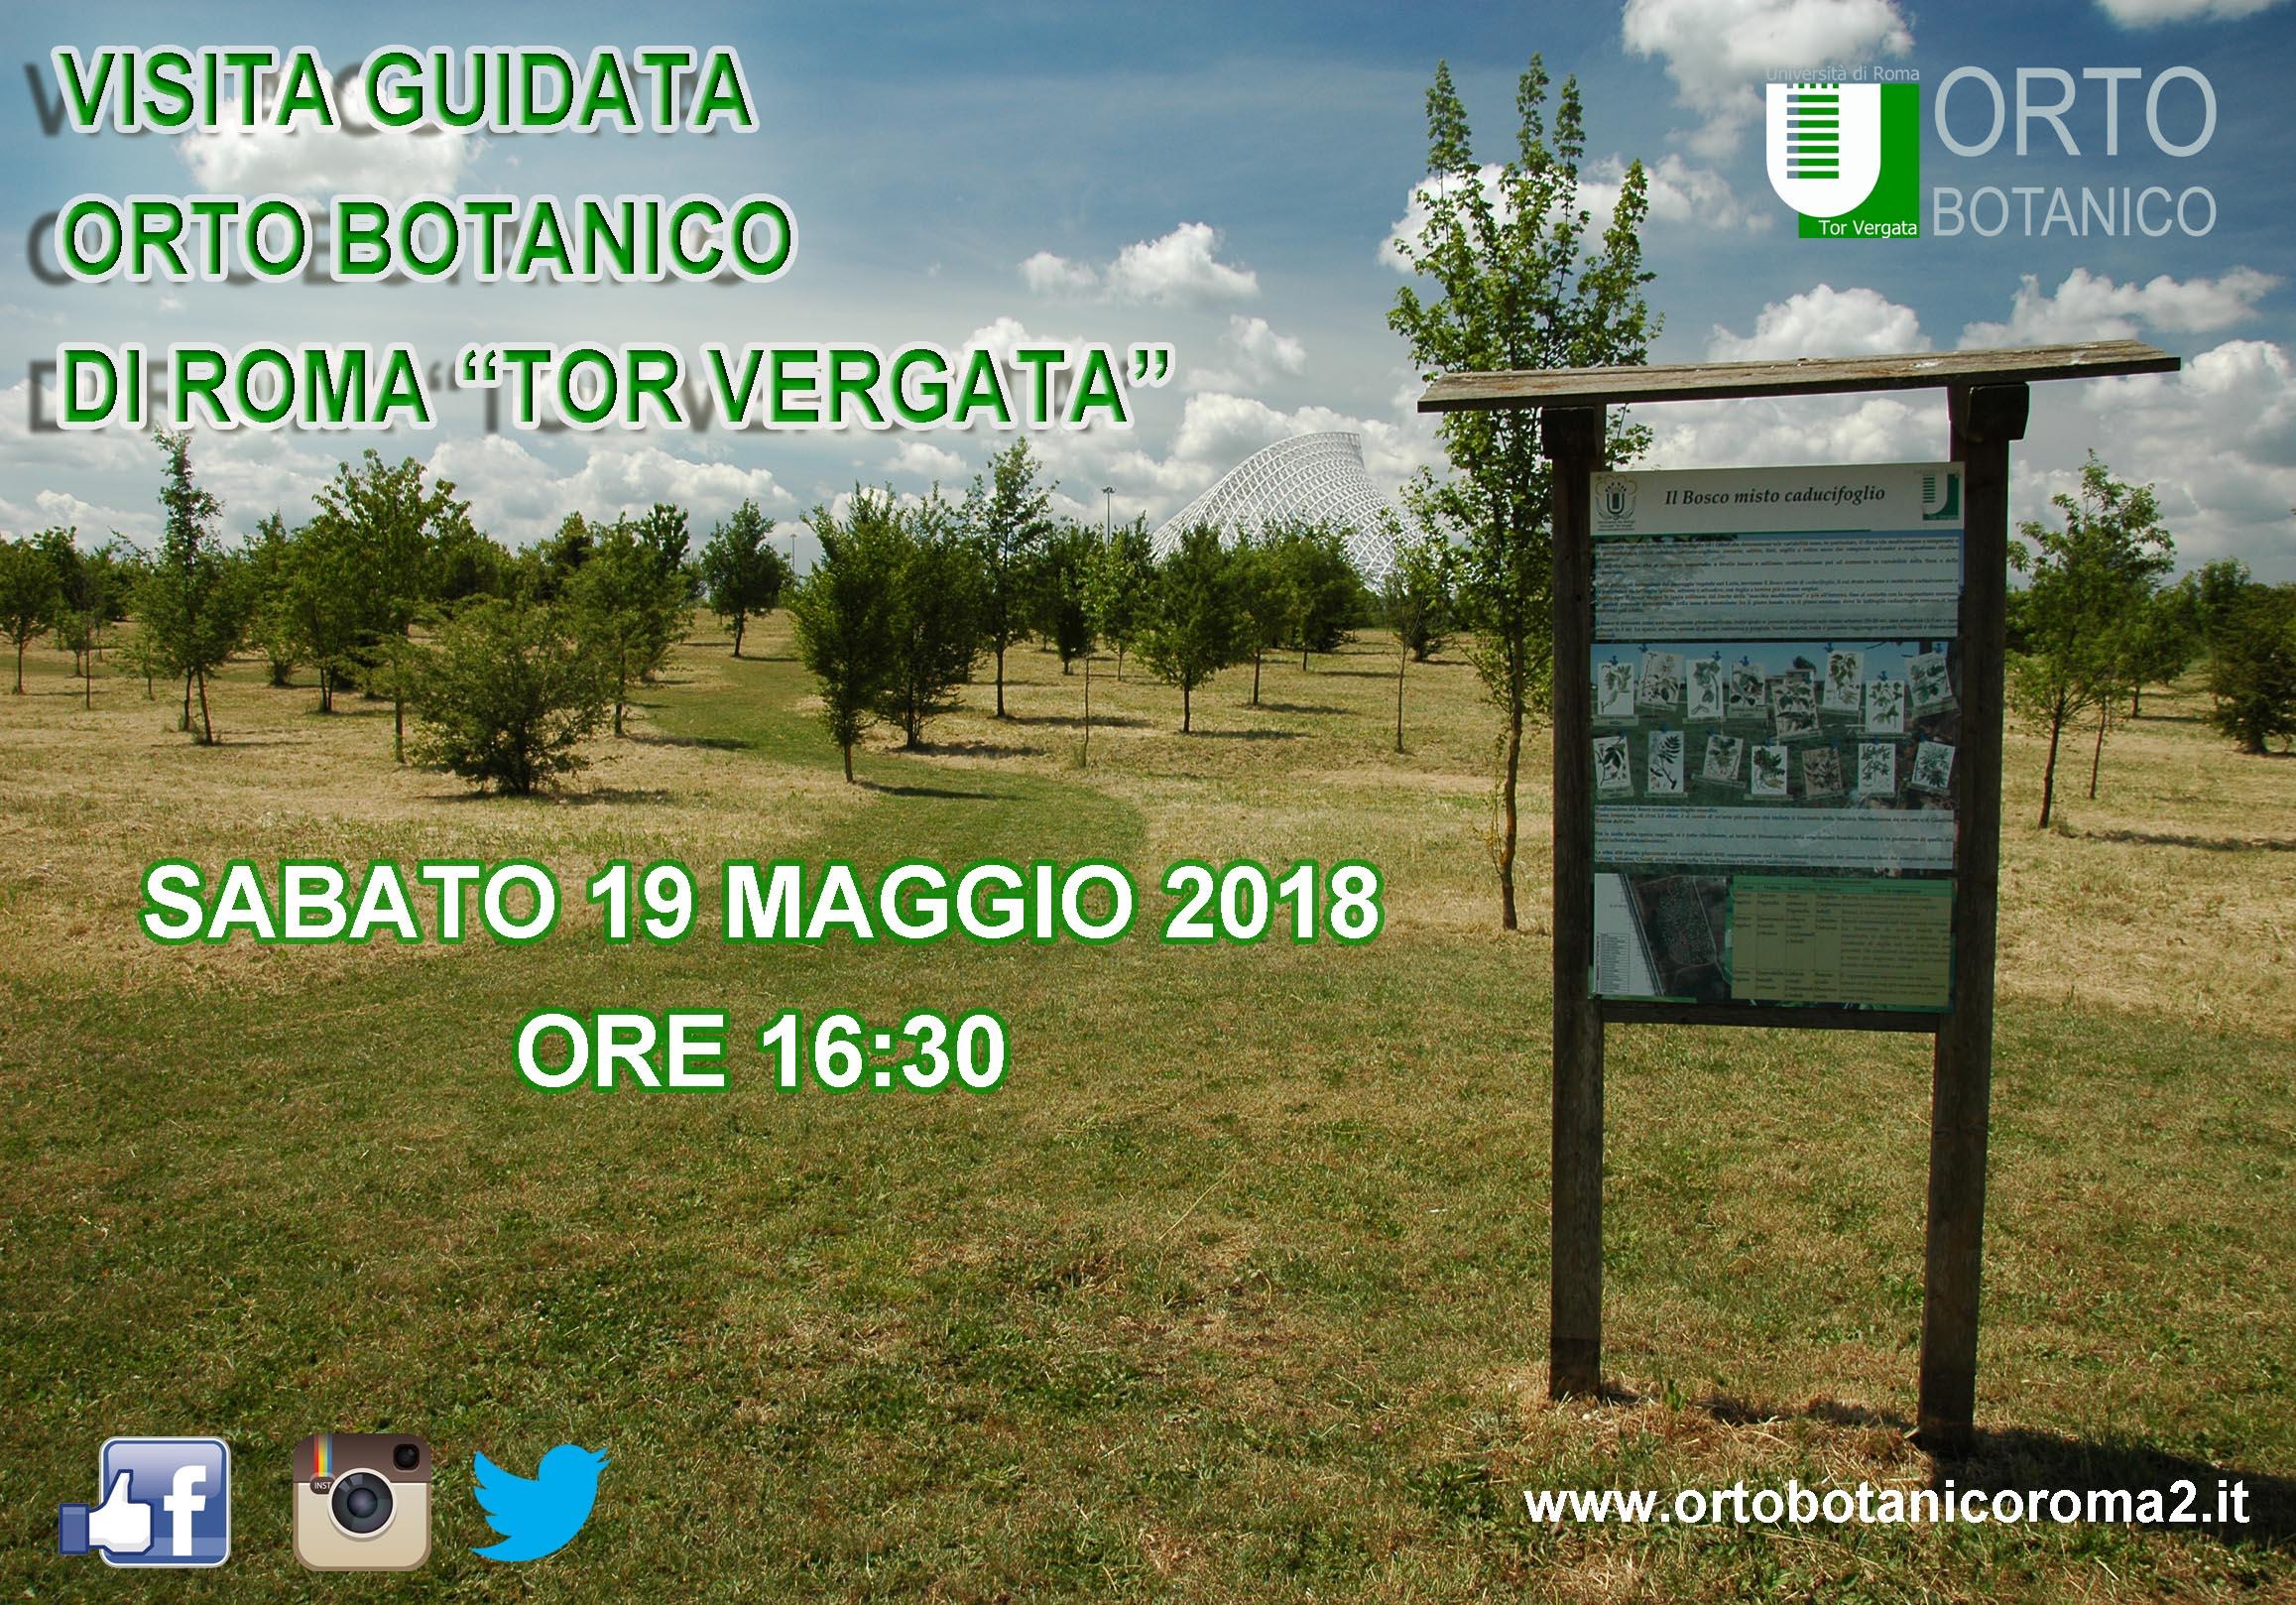 "Visita Guidata Orto Botanico di Roma ""Tor Vergata"""